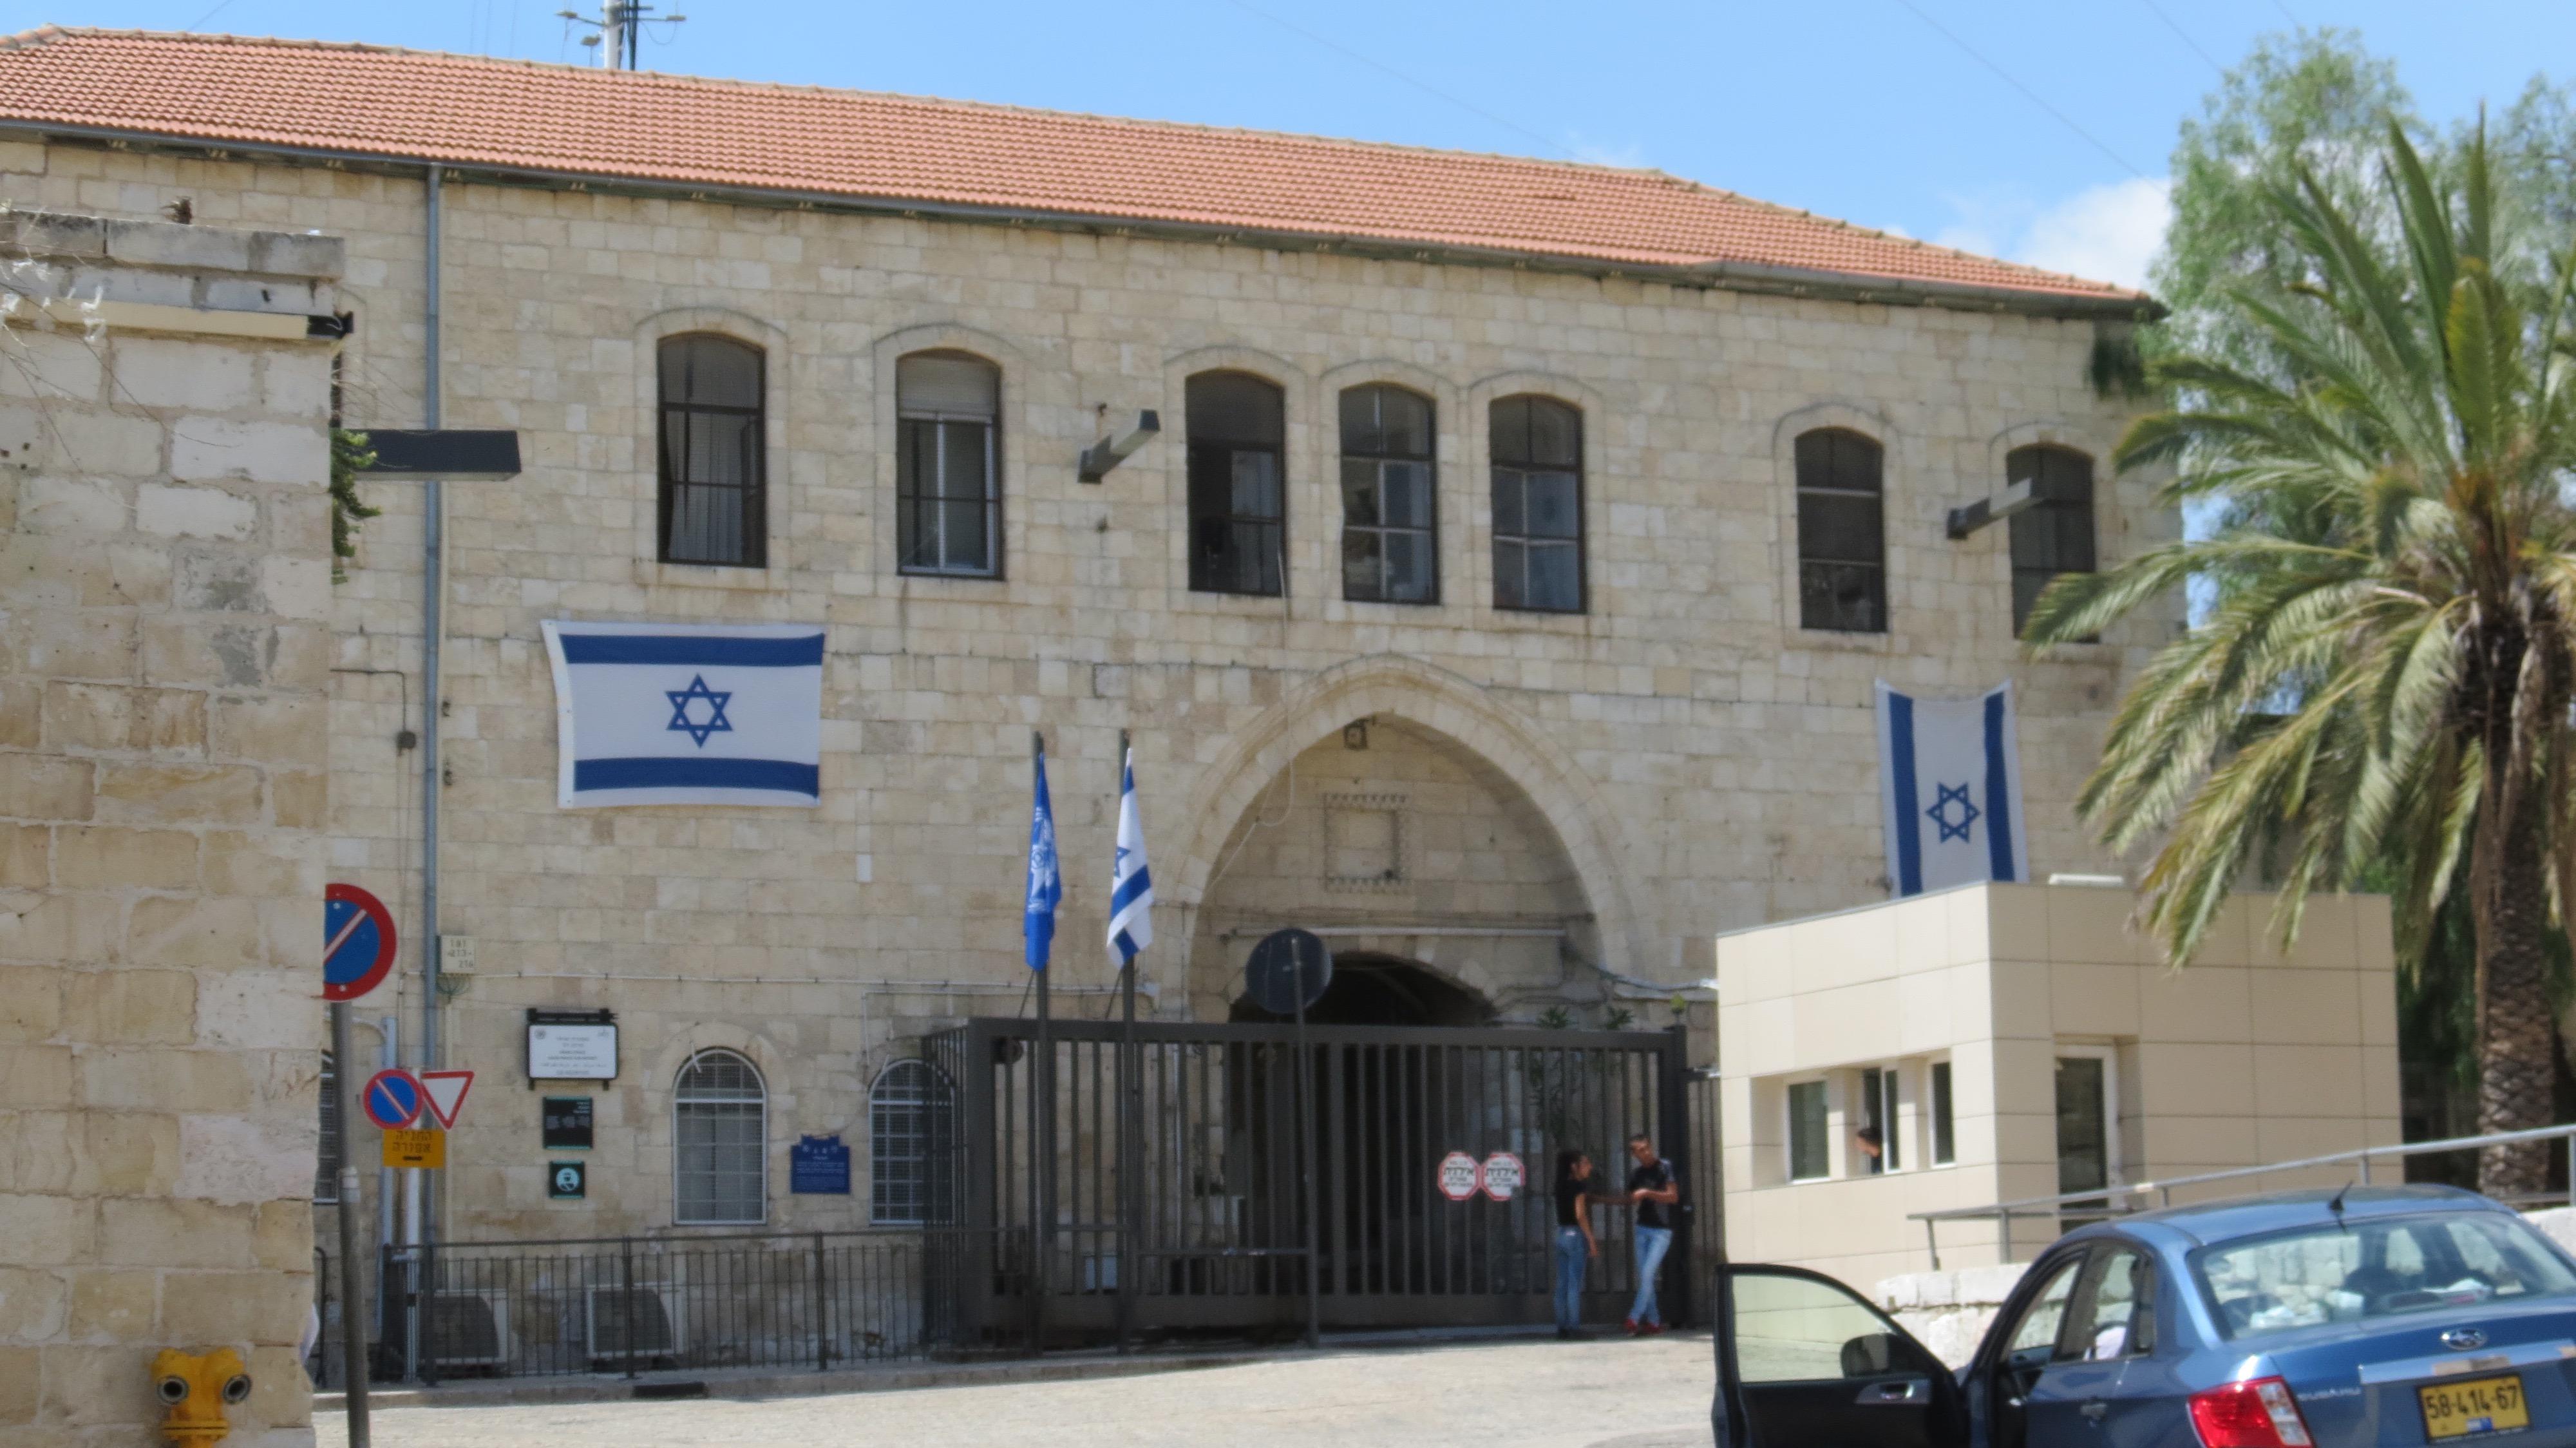 Kishle police station and prison